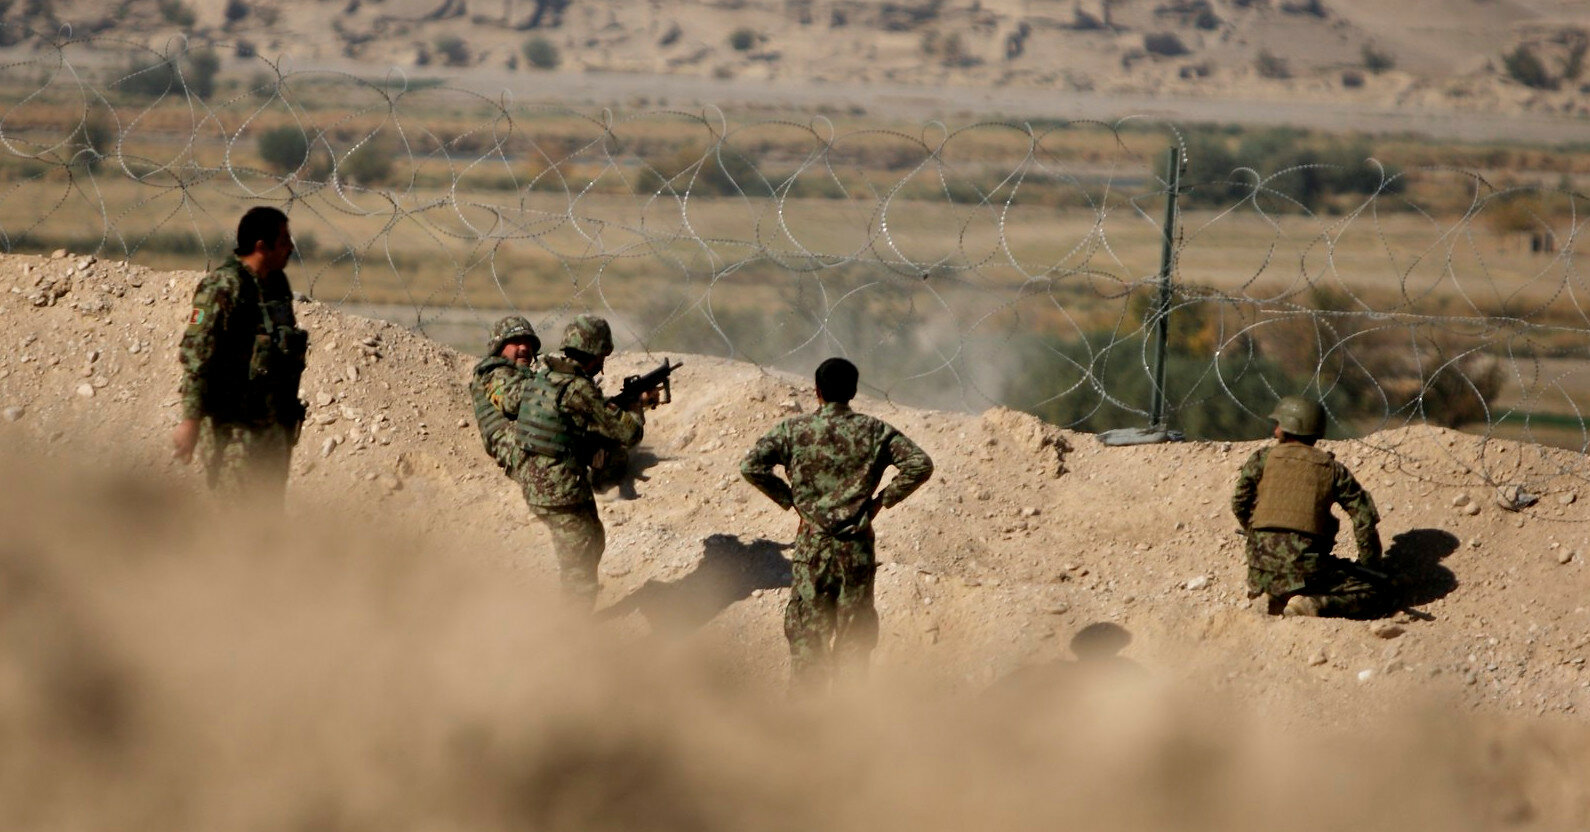 """Талибан"" взял в осаду силы сопротивления"